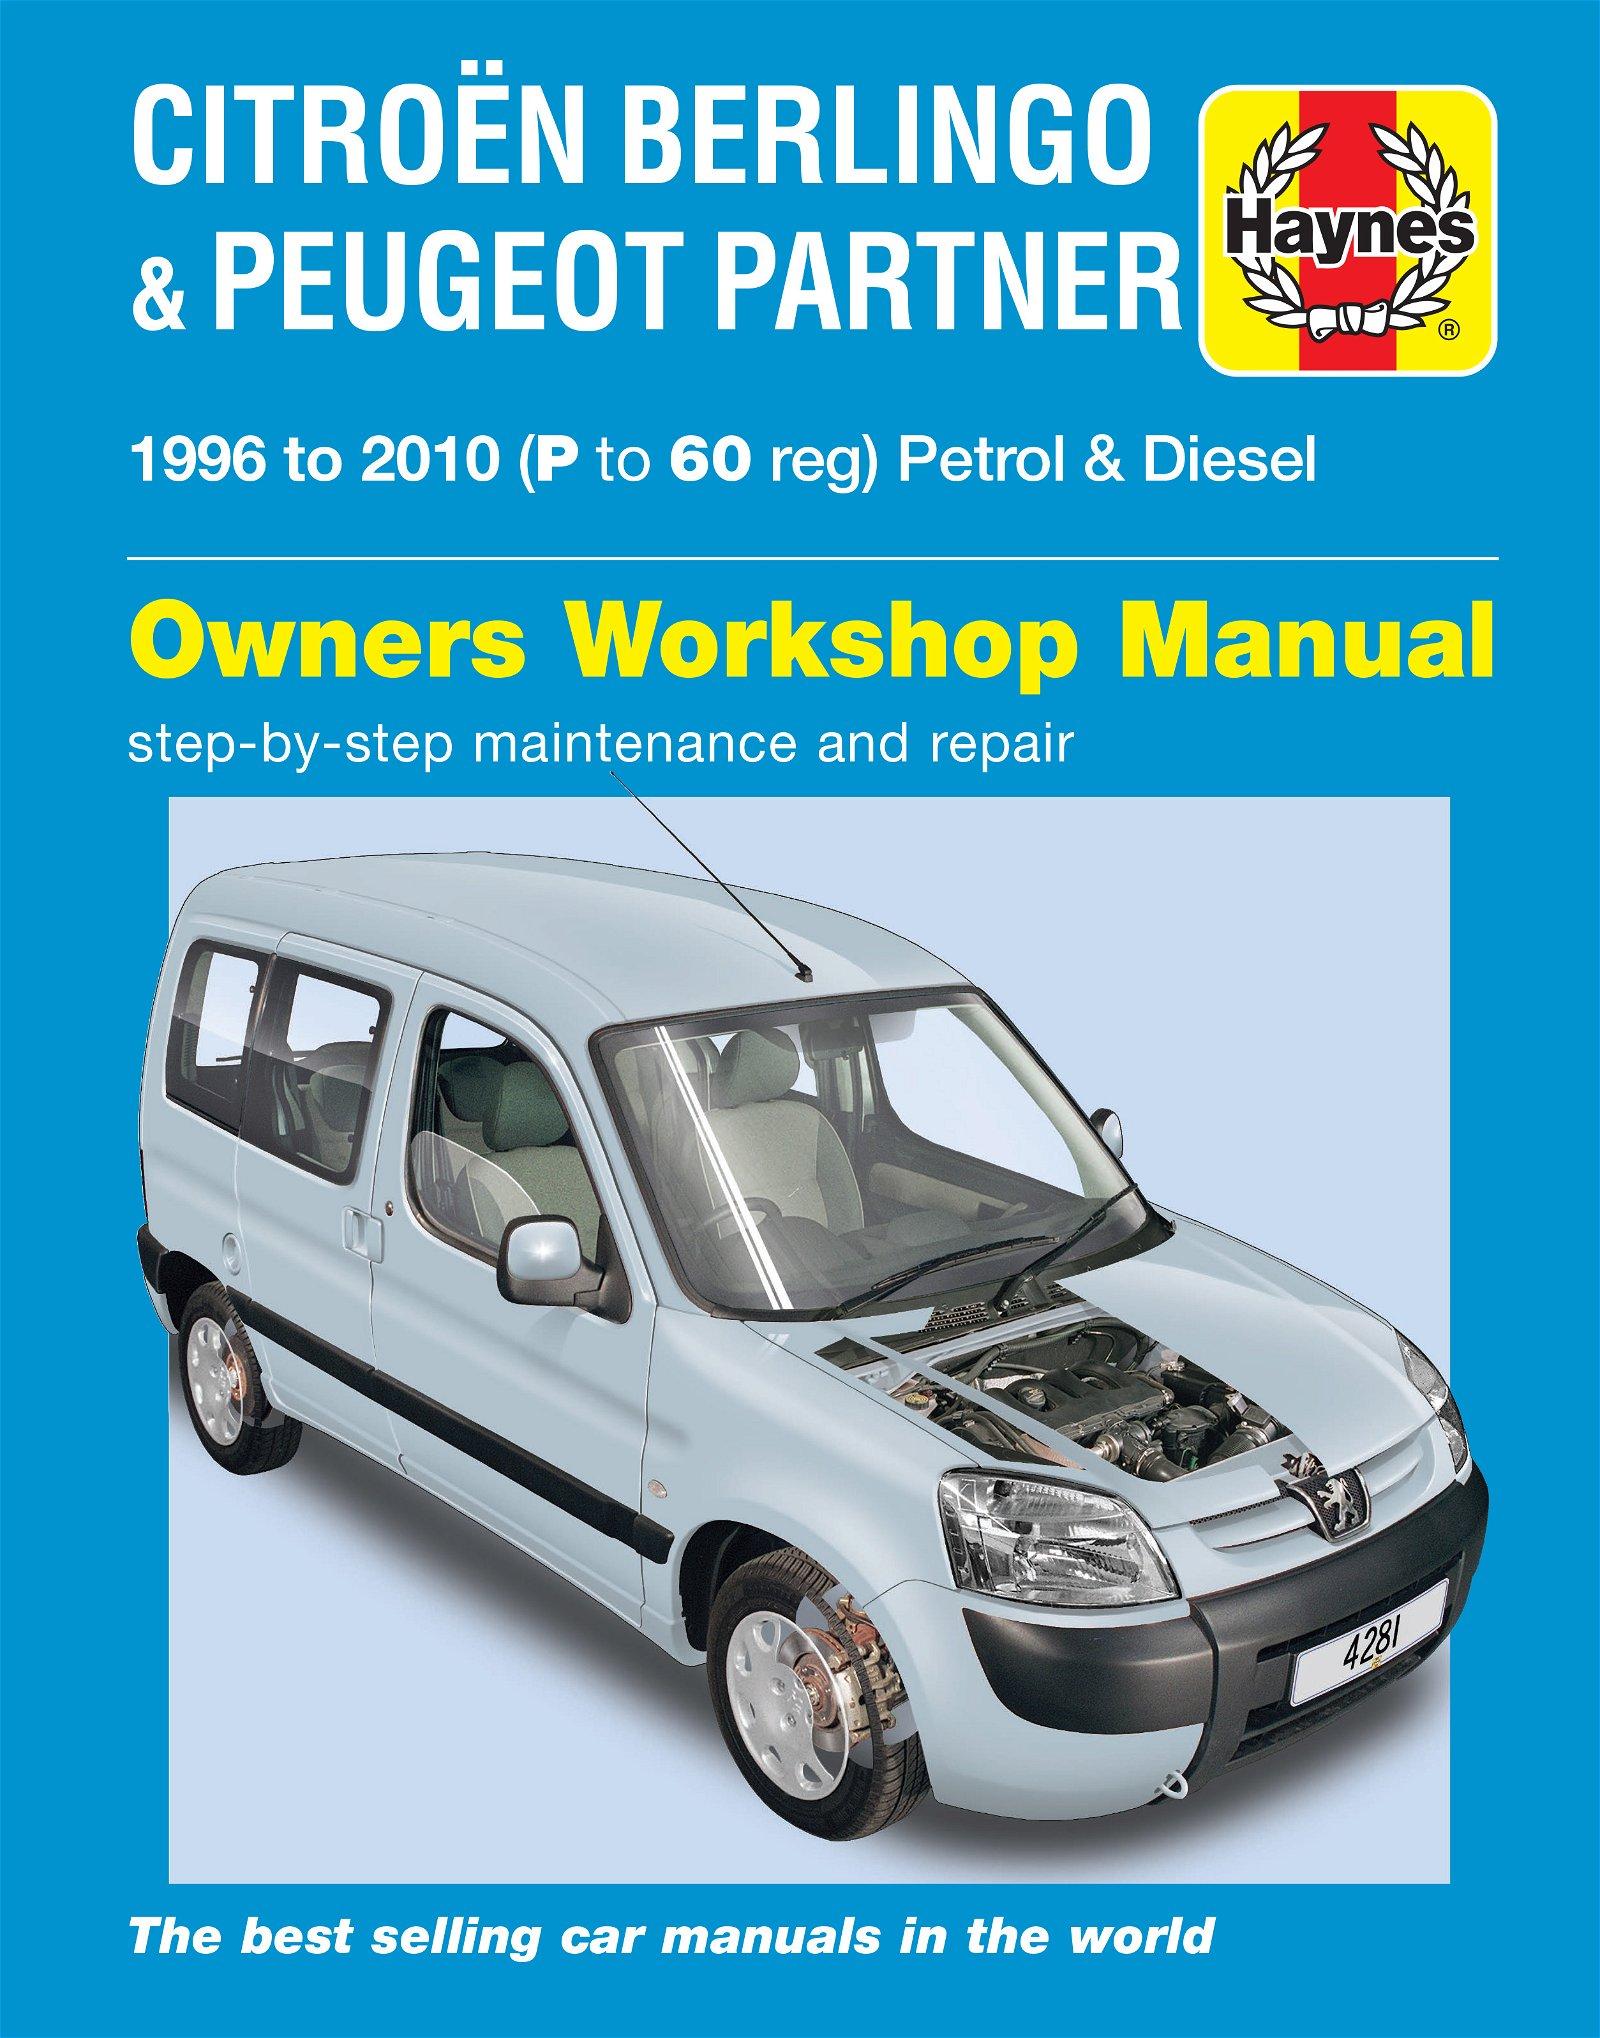 [Manuel UK en Anglais] Citroën Berlingo & Peugeot Partner Petrol & Diesel  (96 - 10)  P to 60